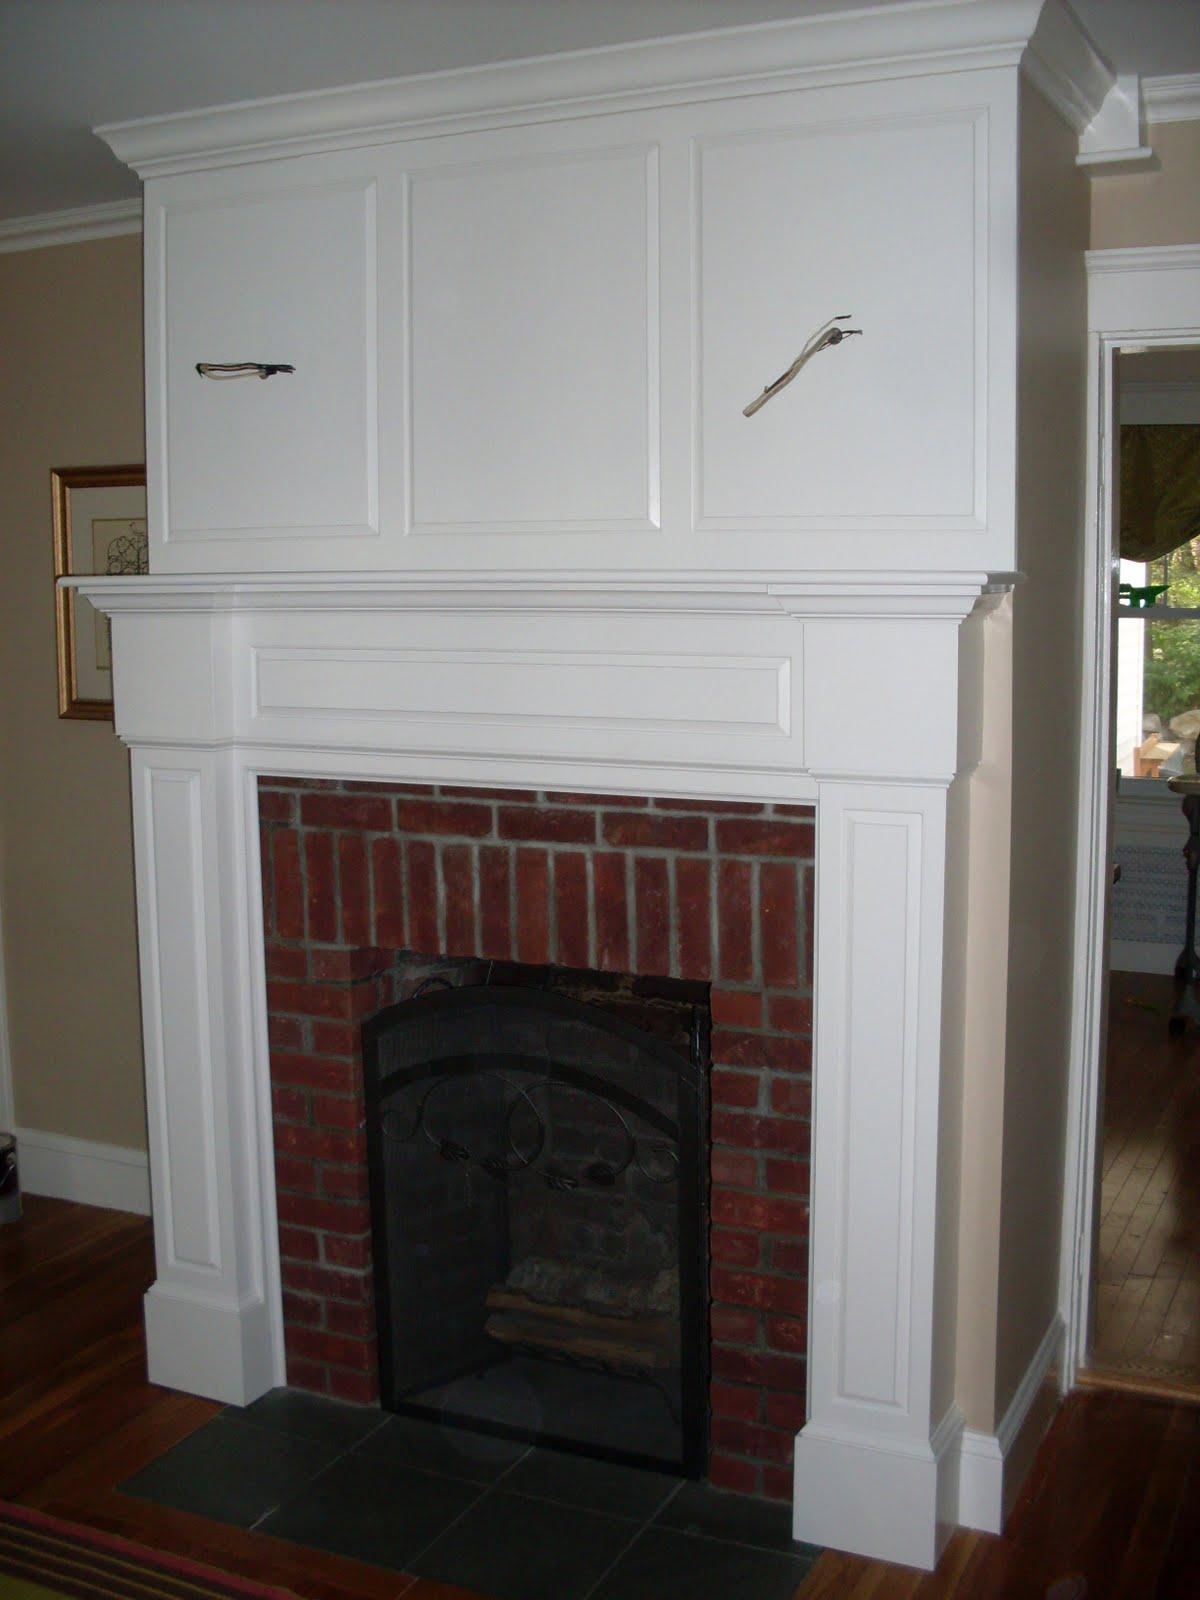 Brick Fireplace Mantel Shelf More mantel fun